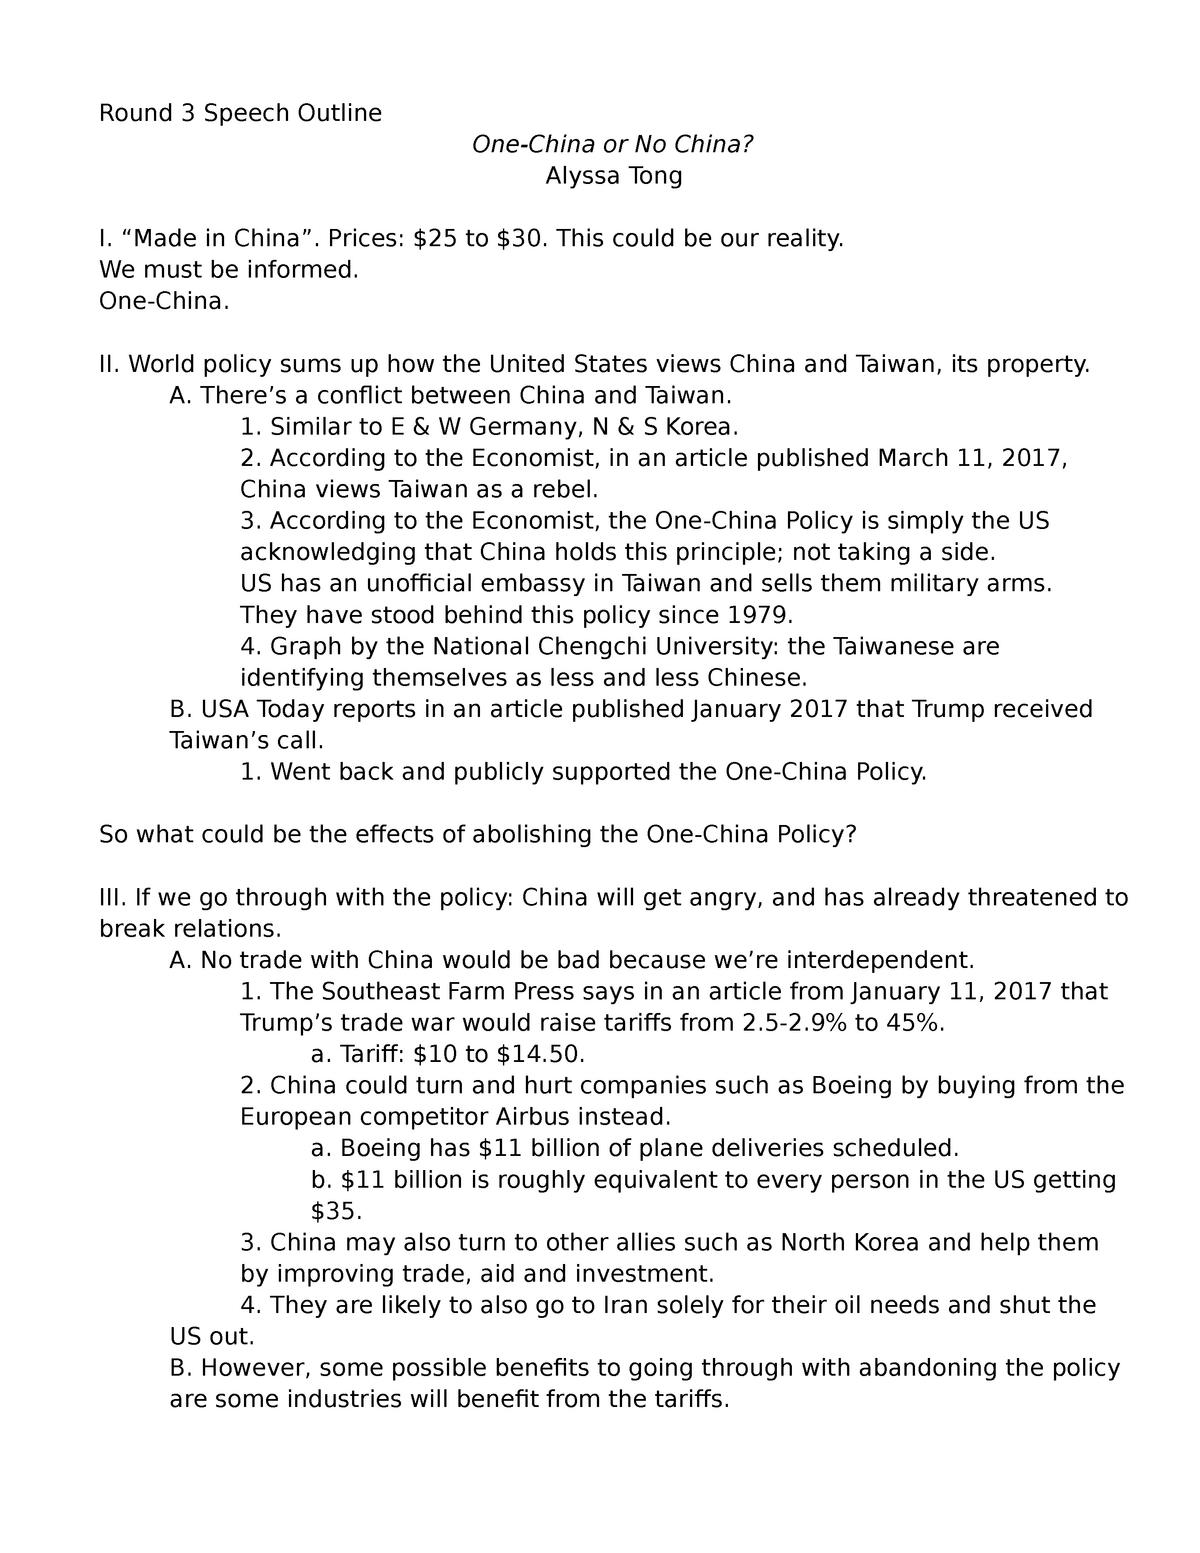 Round 3 Keyword Outline Cmn 101 Studocu